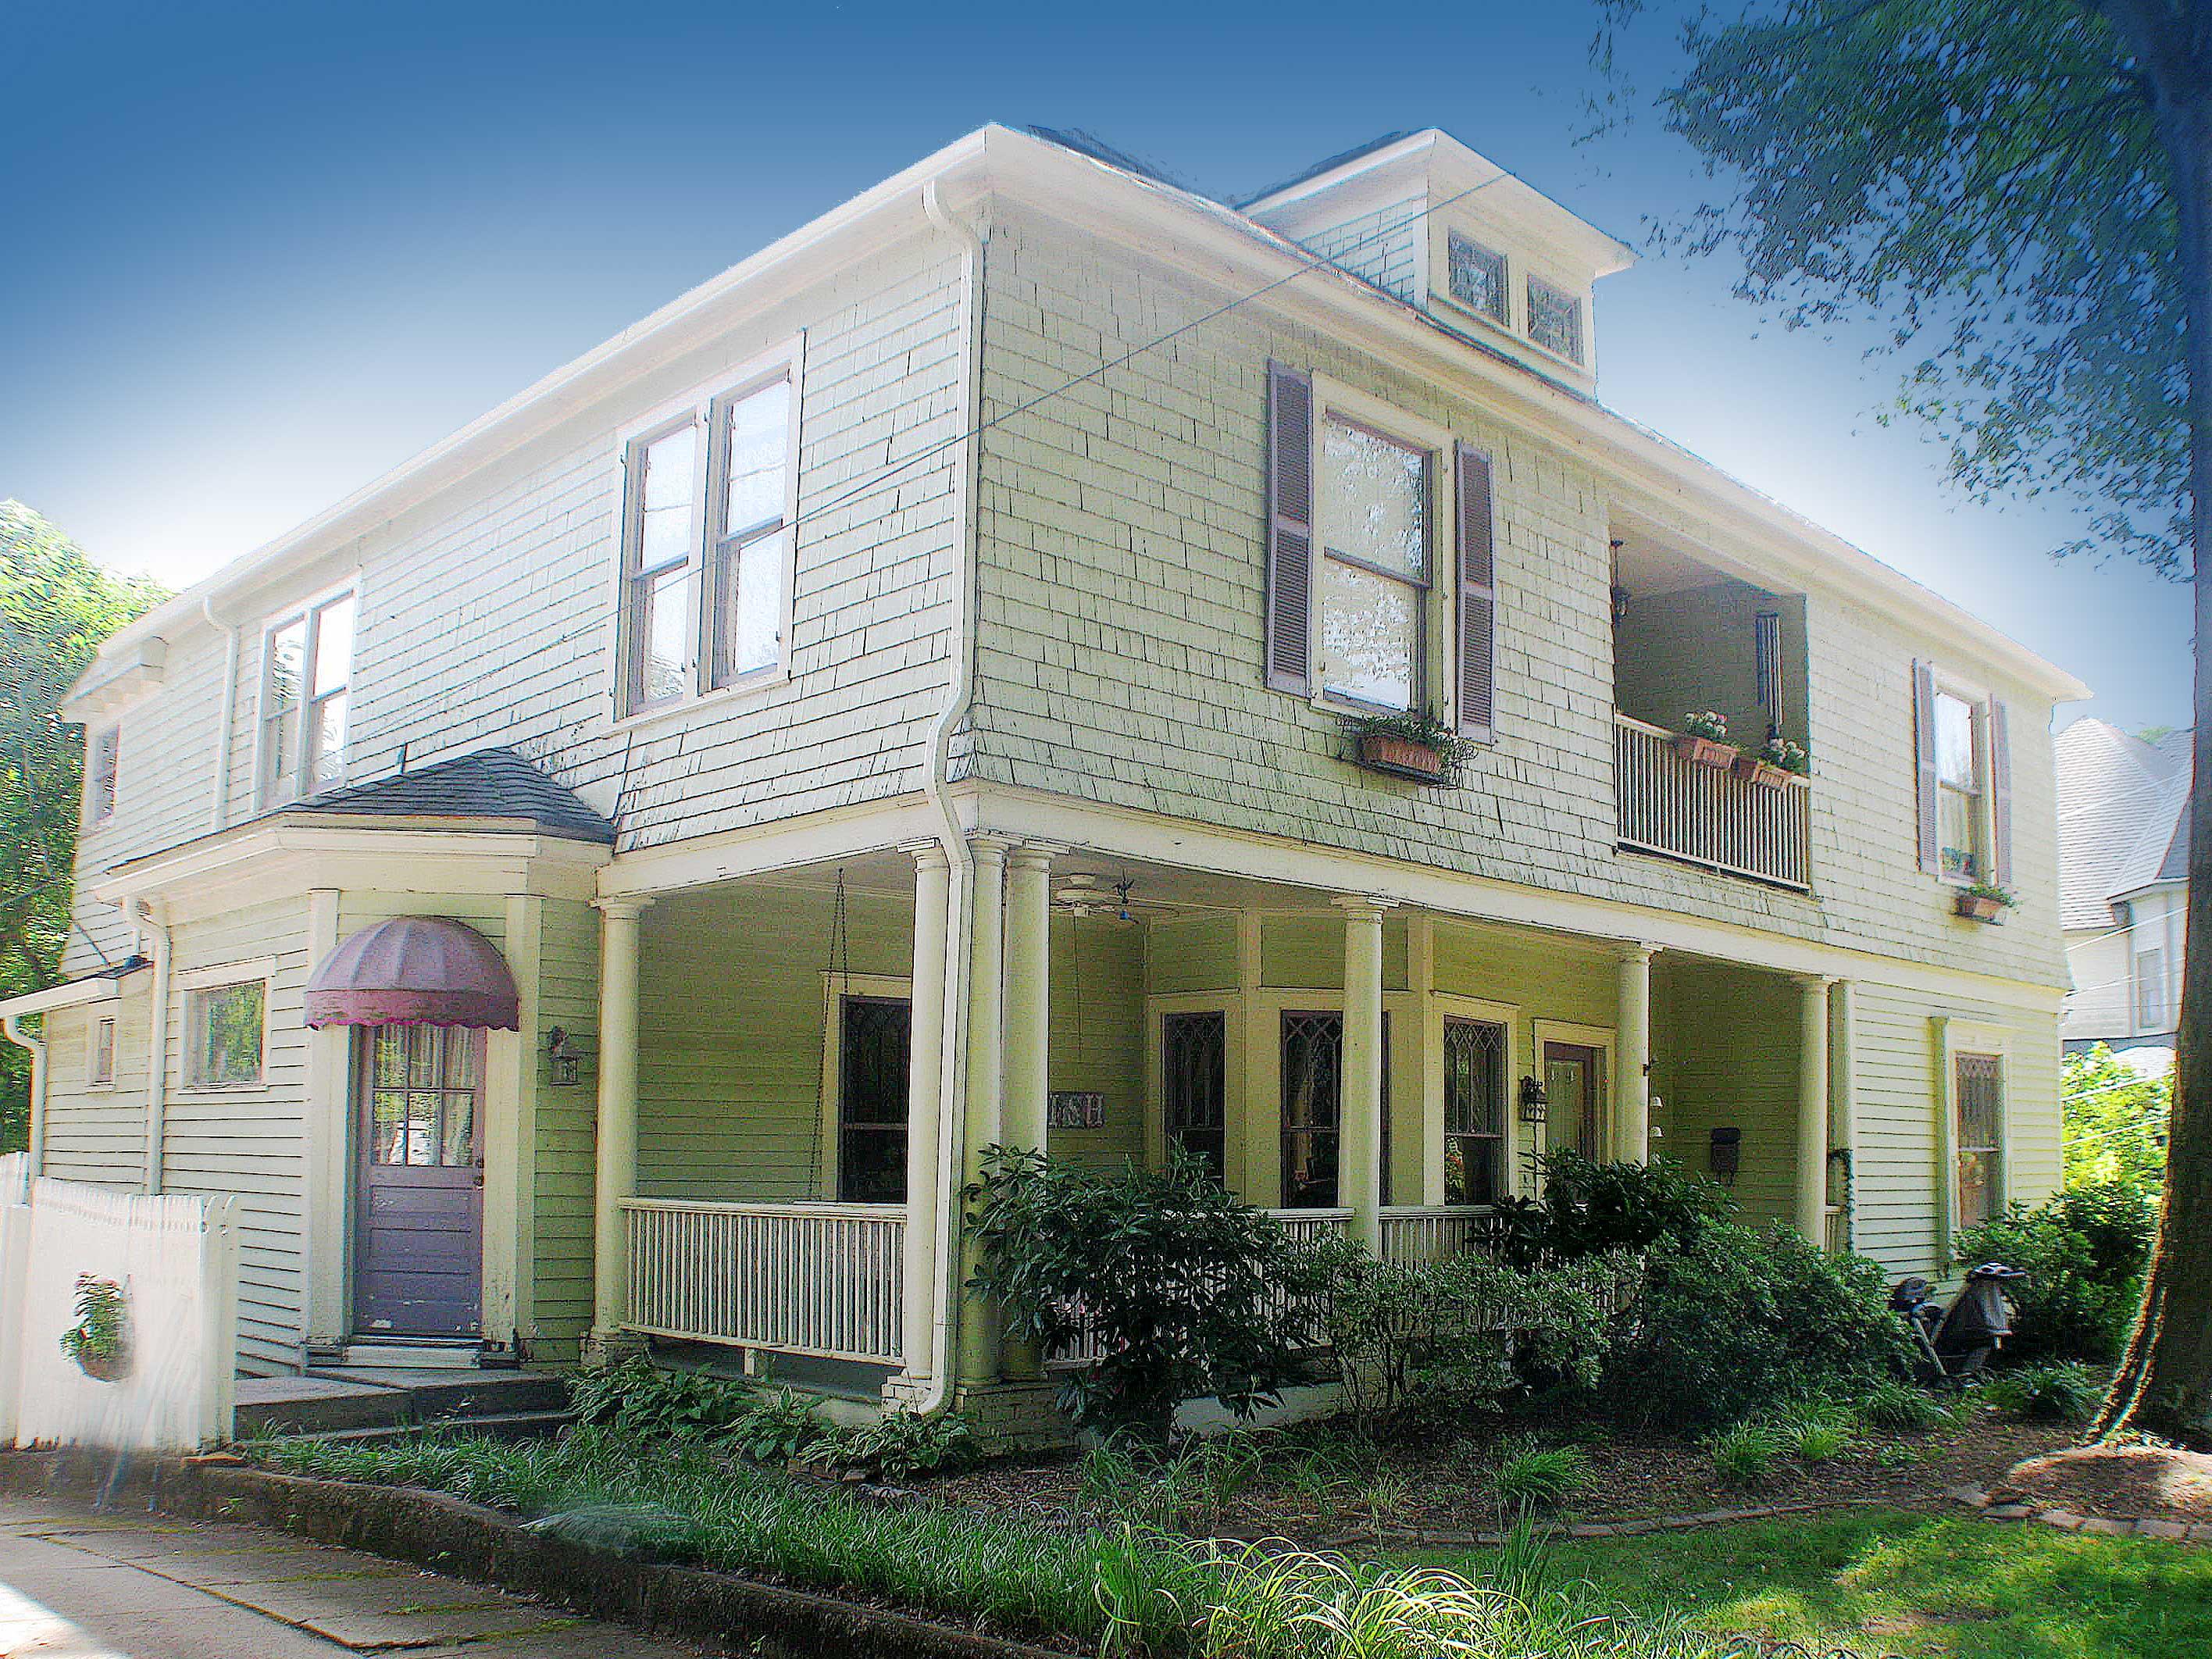 159 Union St. Concord